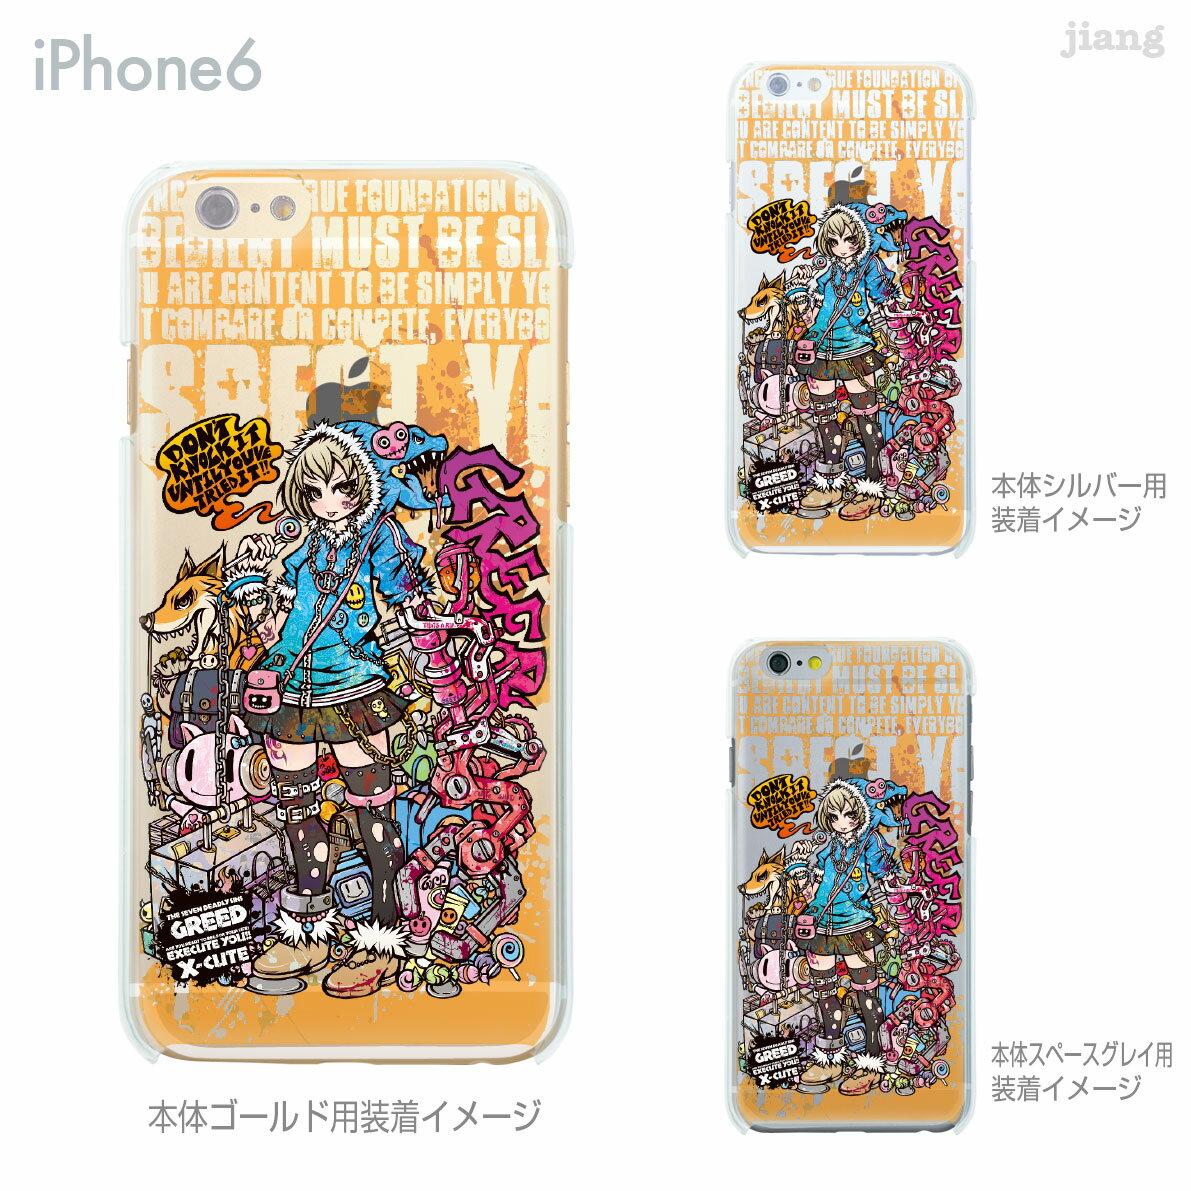 iPhoneX iPhone X アイフォンX ケース iPhone8 iPhone7ケース iPhone7 Plus iPhone6s iPhone6 Plus iphone ハードケース Clear Arts ケース カバー スマホケース クリアケース Project.C.K. 強欲 11-ip6-ca0021-s